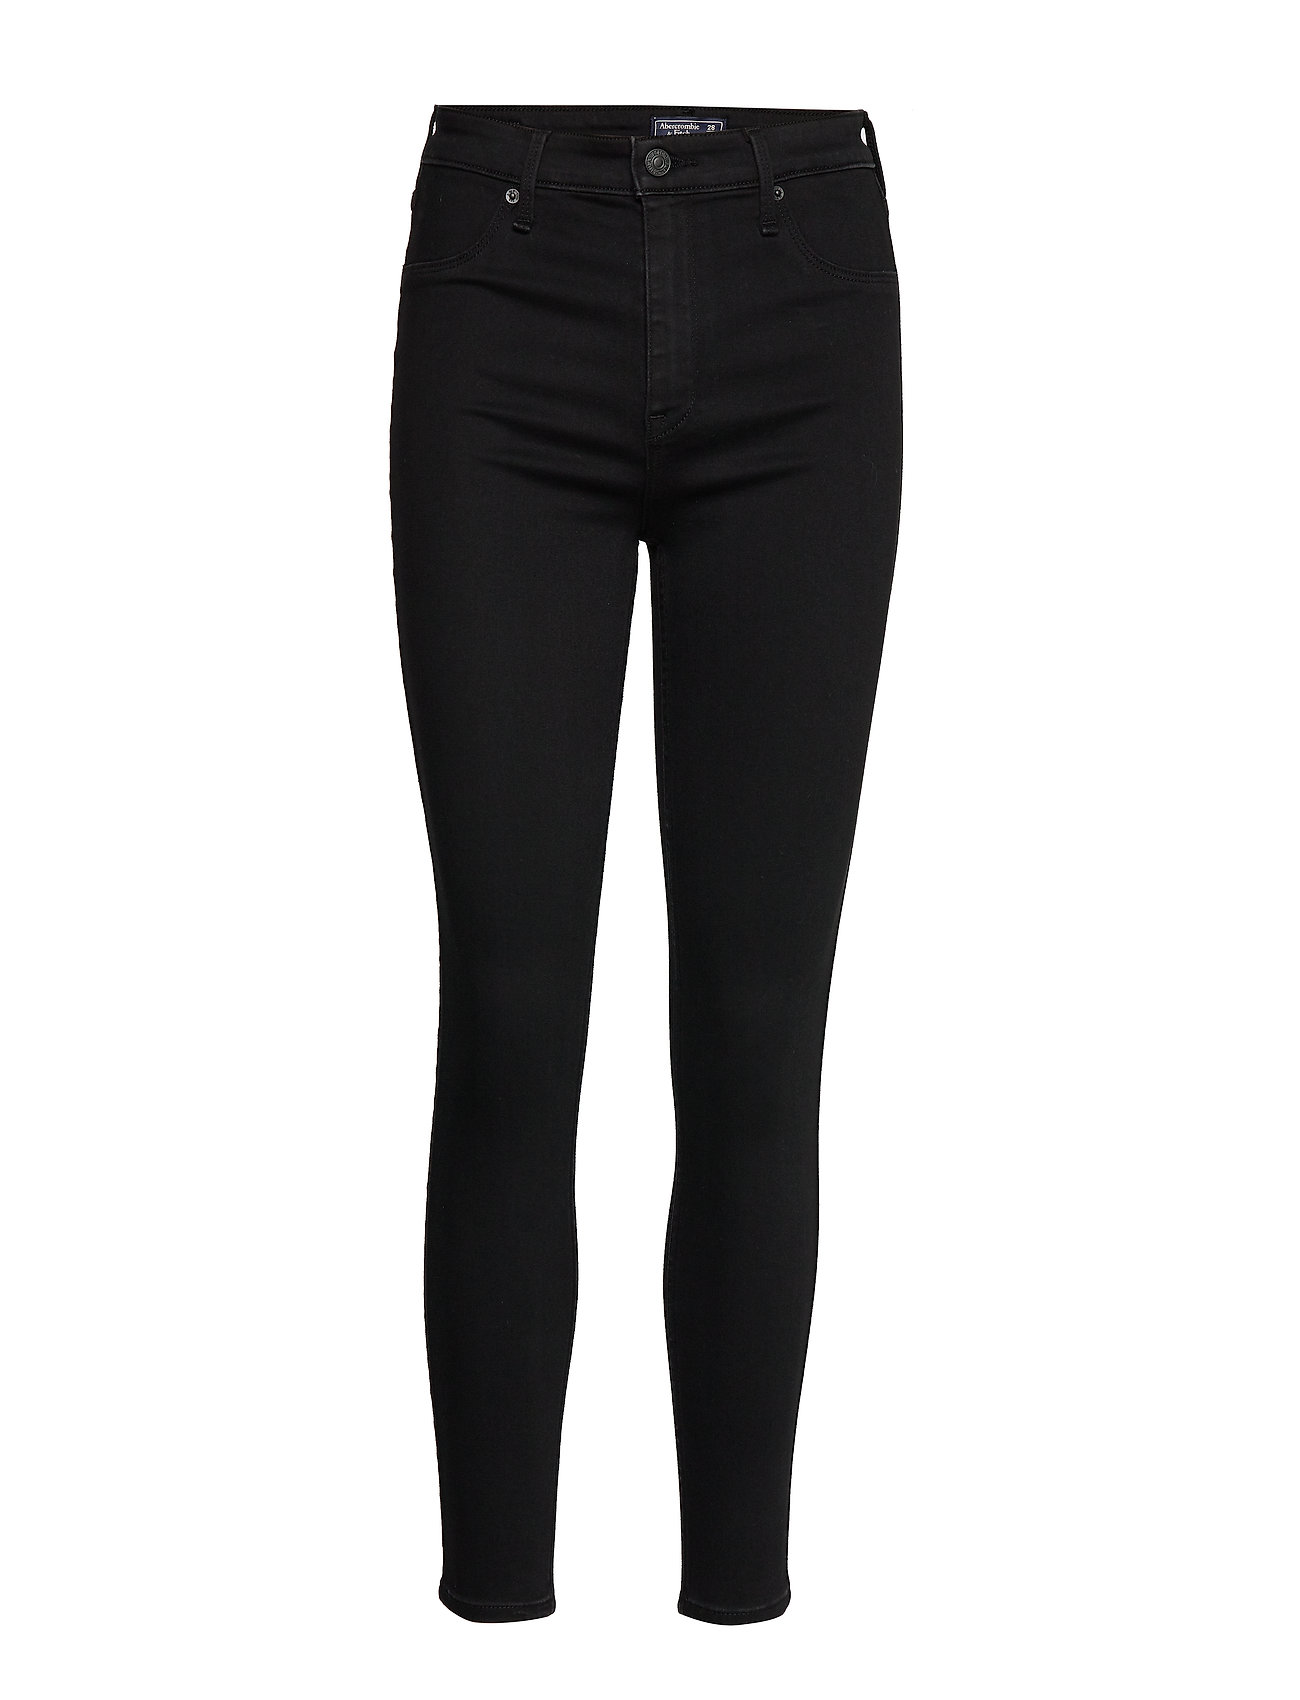 Abercrombie & Fitch High Rise Jean Legging - BLACK OD